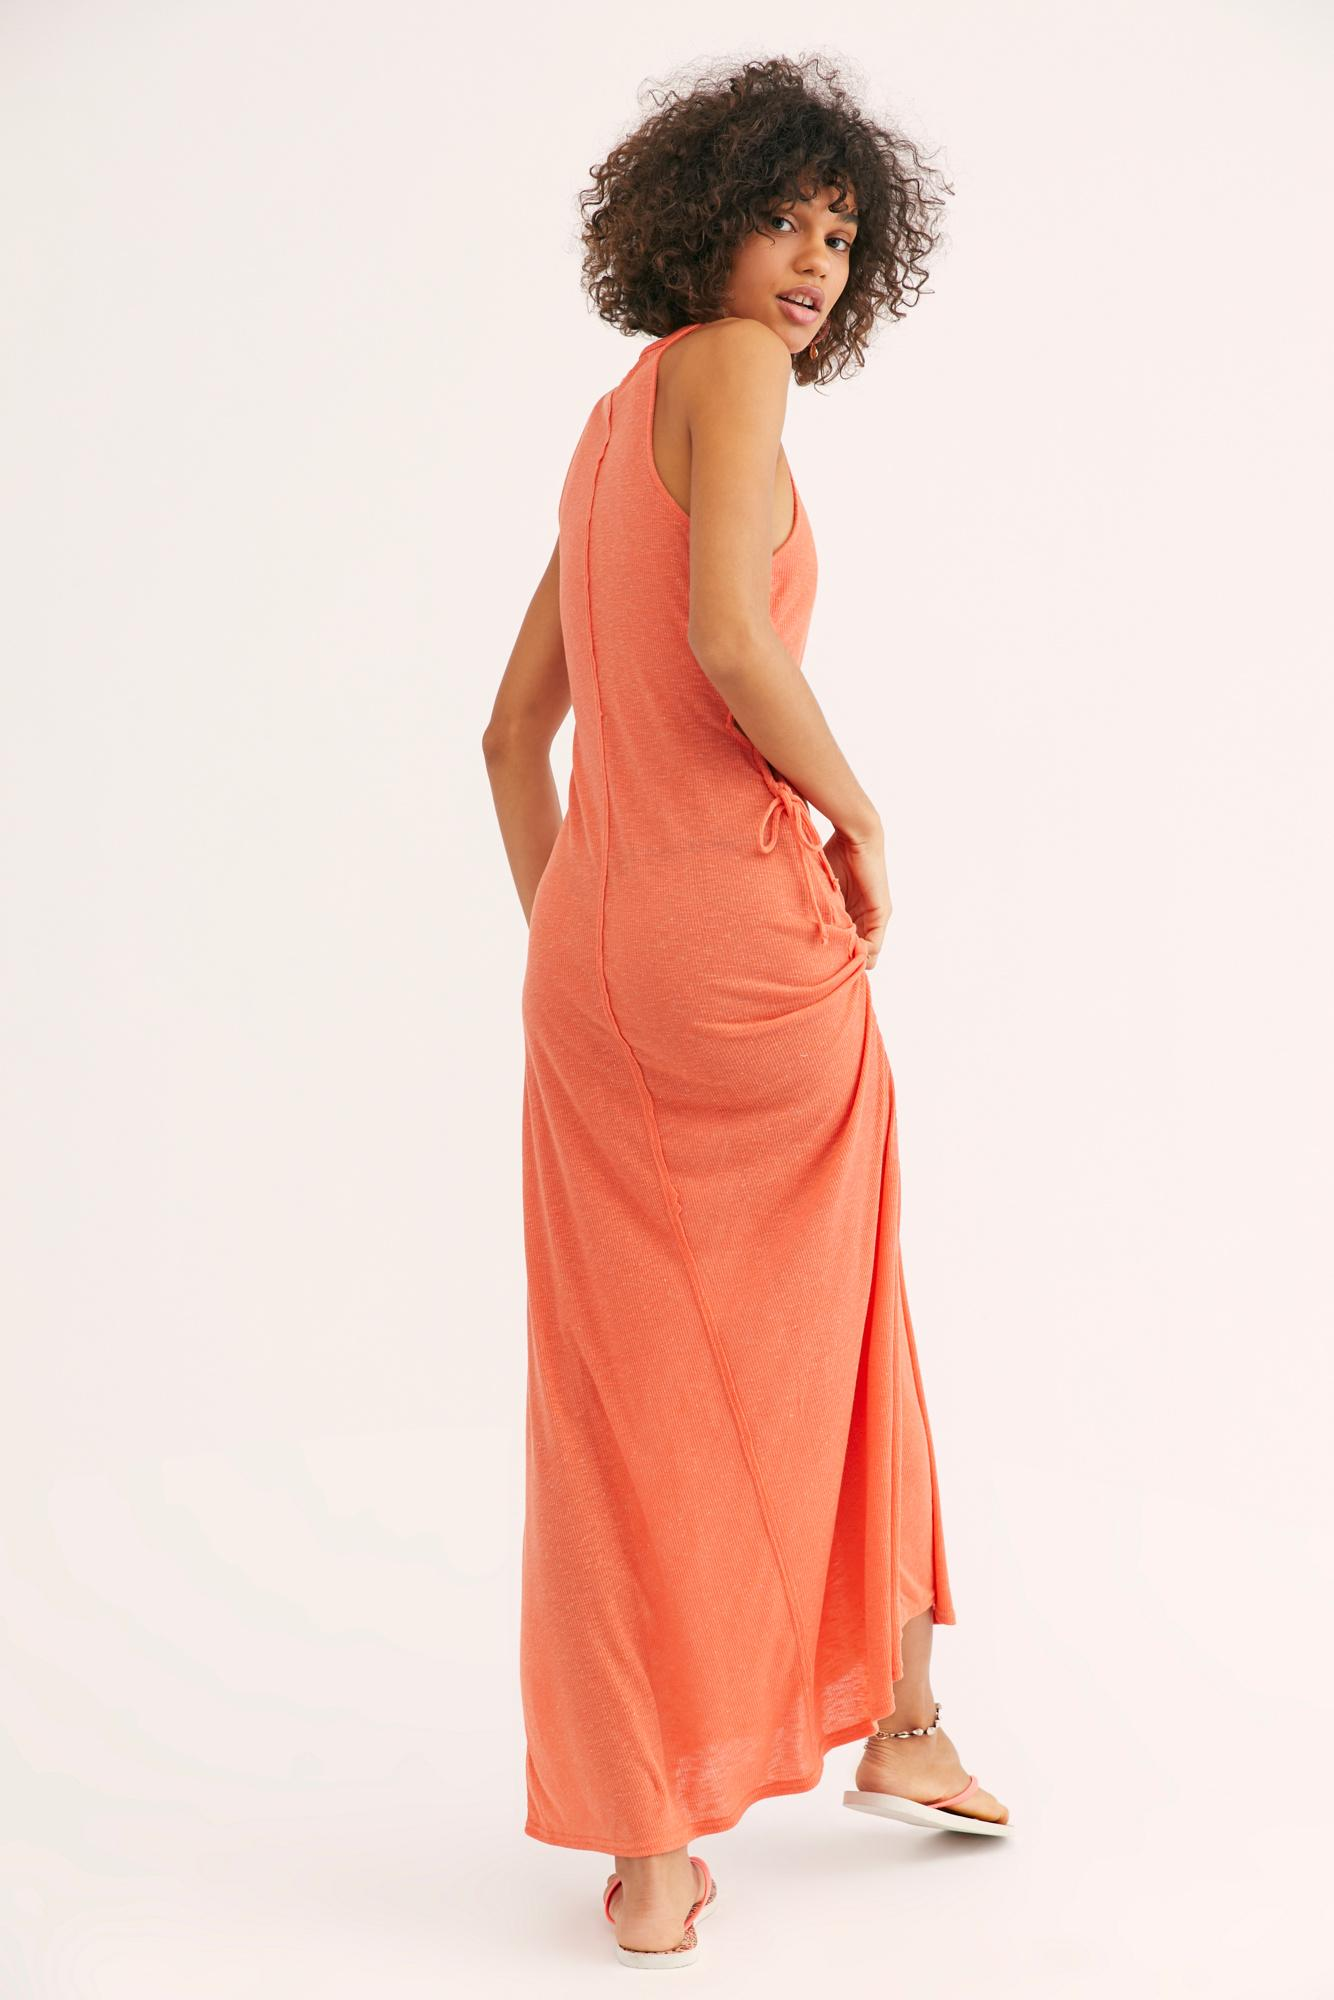 Primrose Maxi Dress   Long dresses casual maxi, Spring